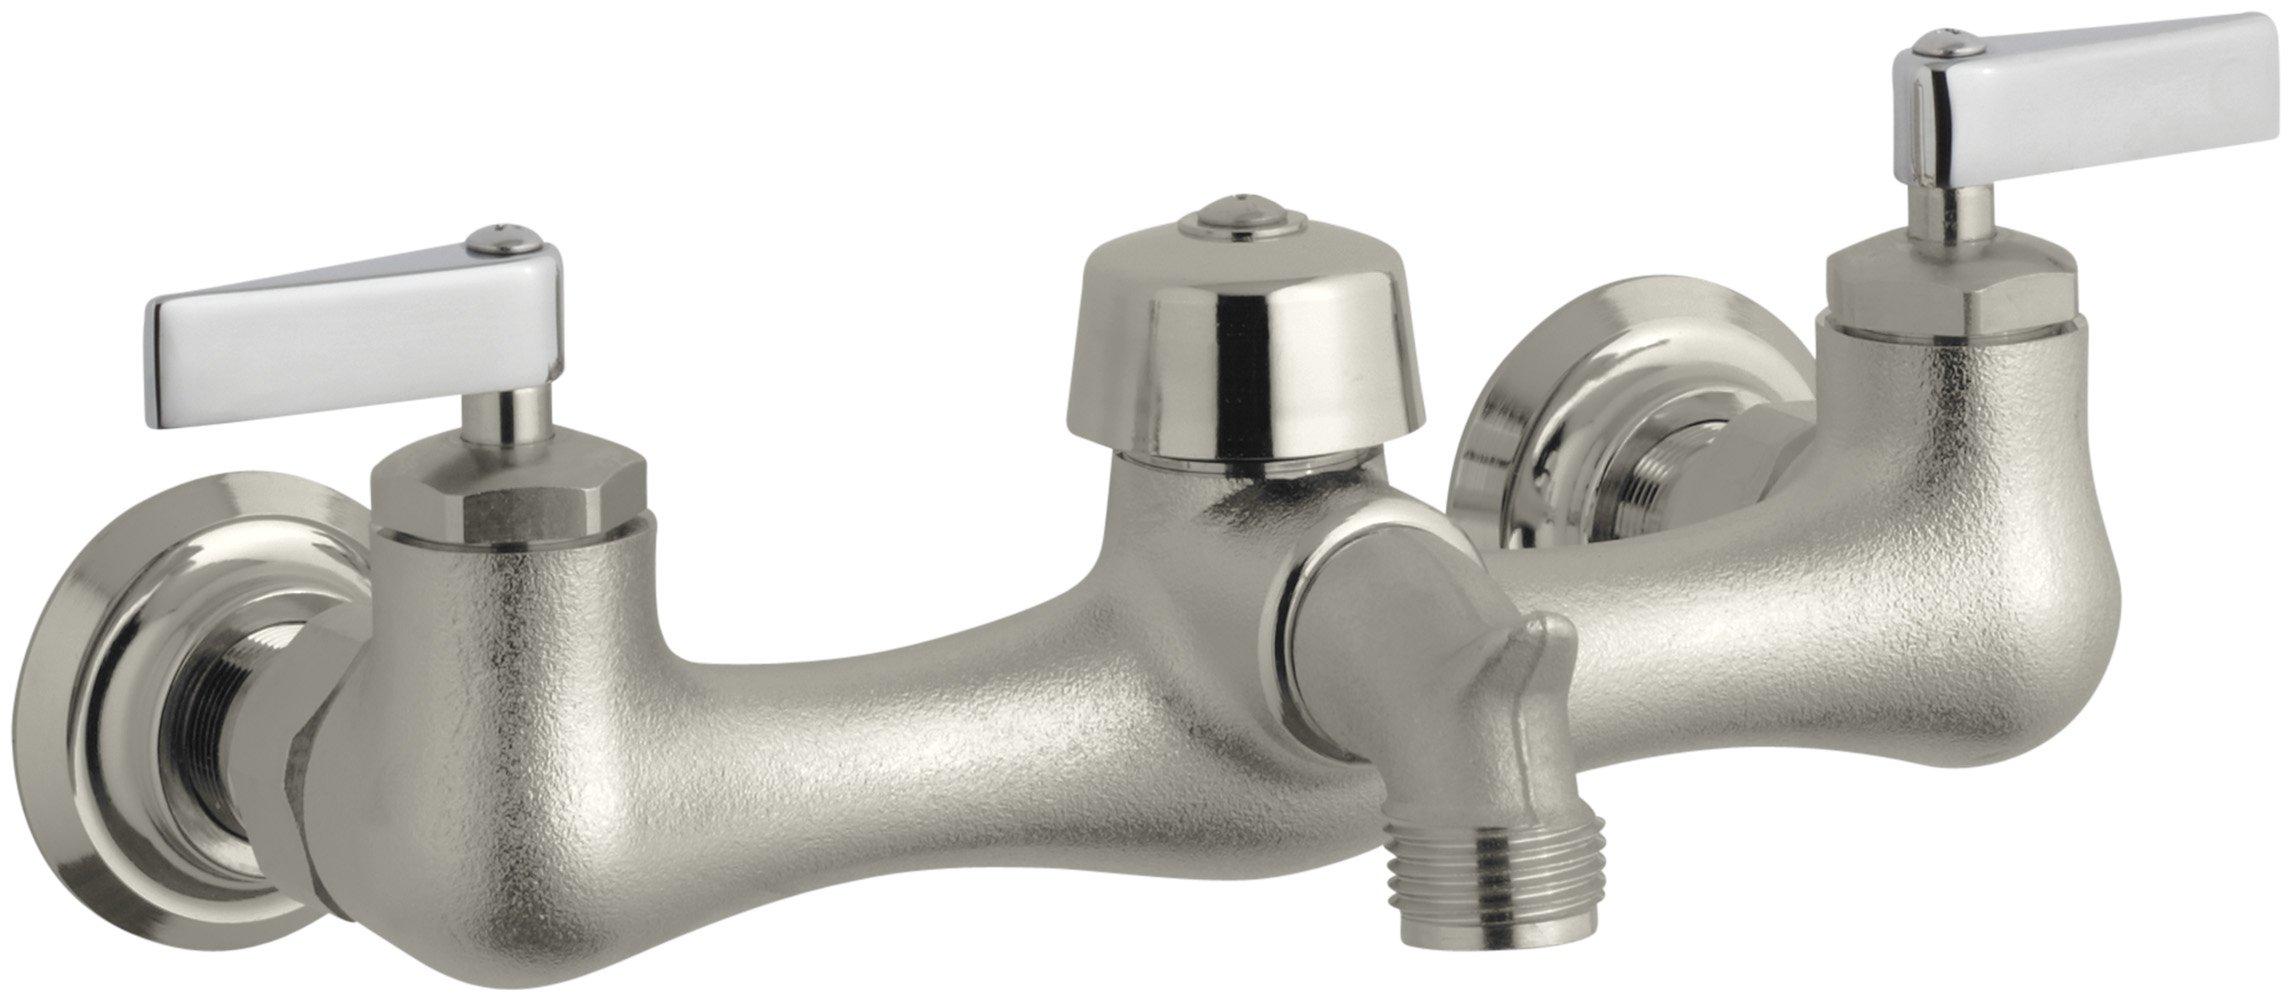 KOHLER K-8905-RP Knoxford Service Sink Faucet, Rough Plate by Kohler